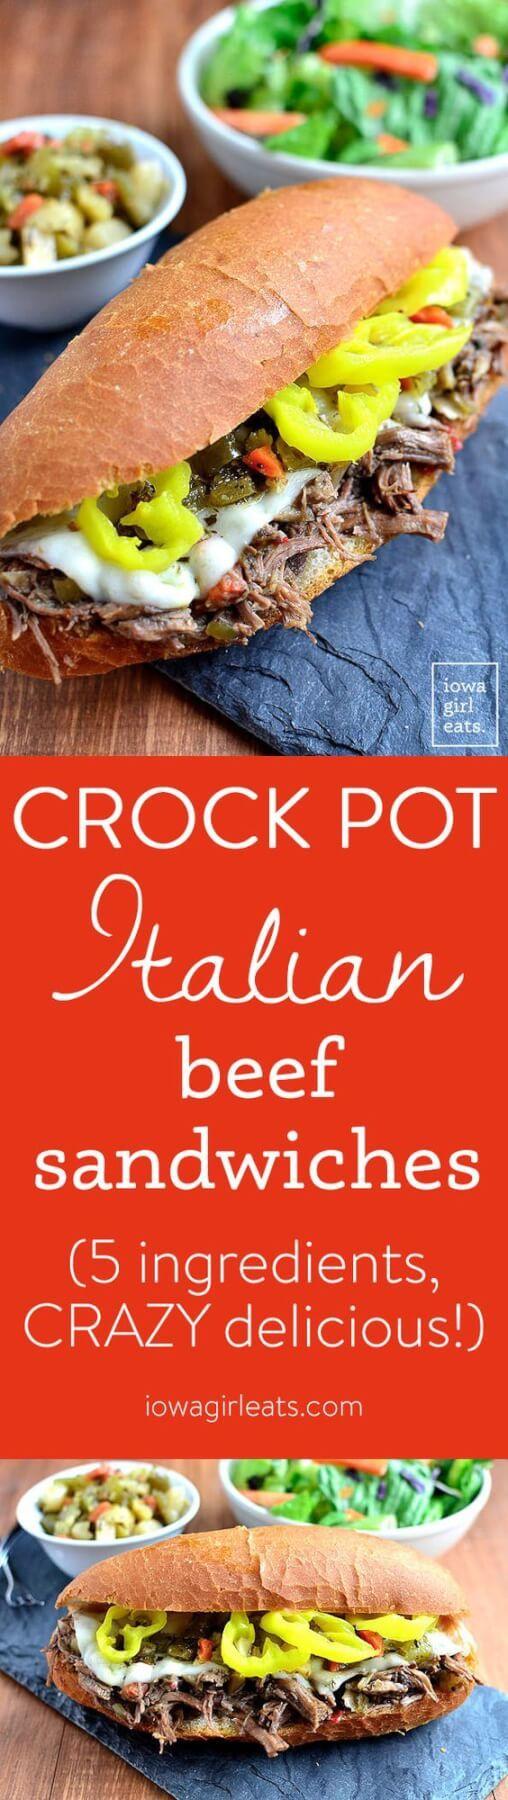 Crock Pot Italian Beef Sandwiches Recipe